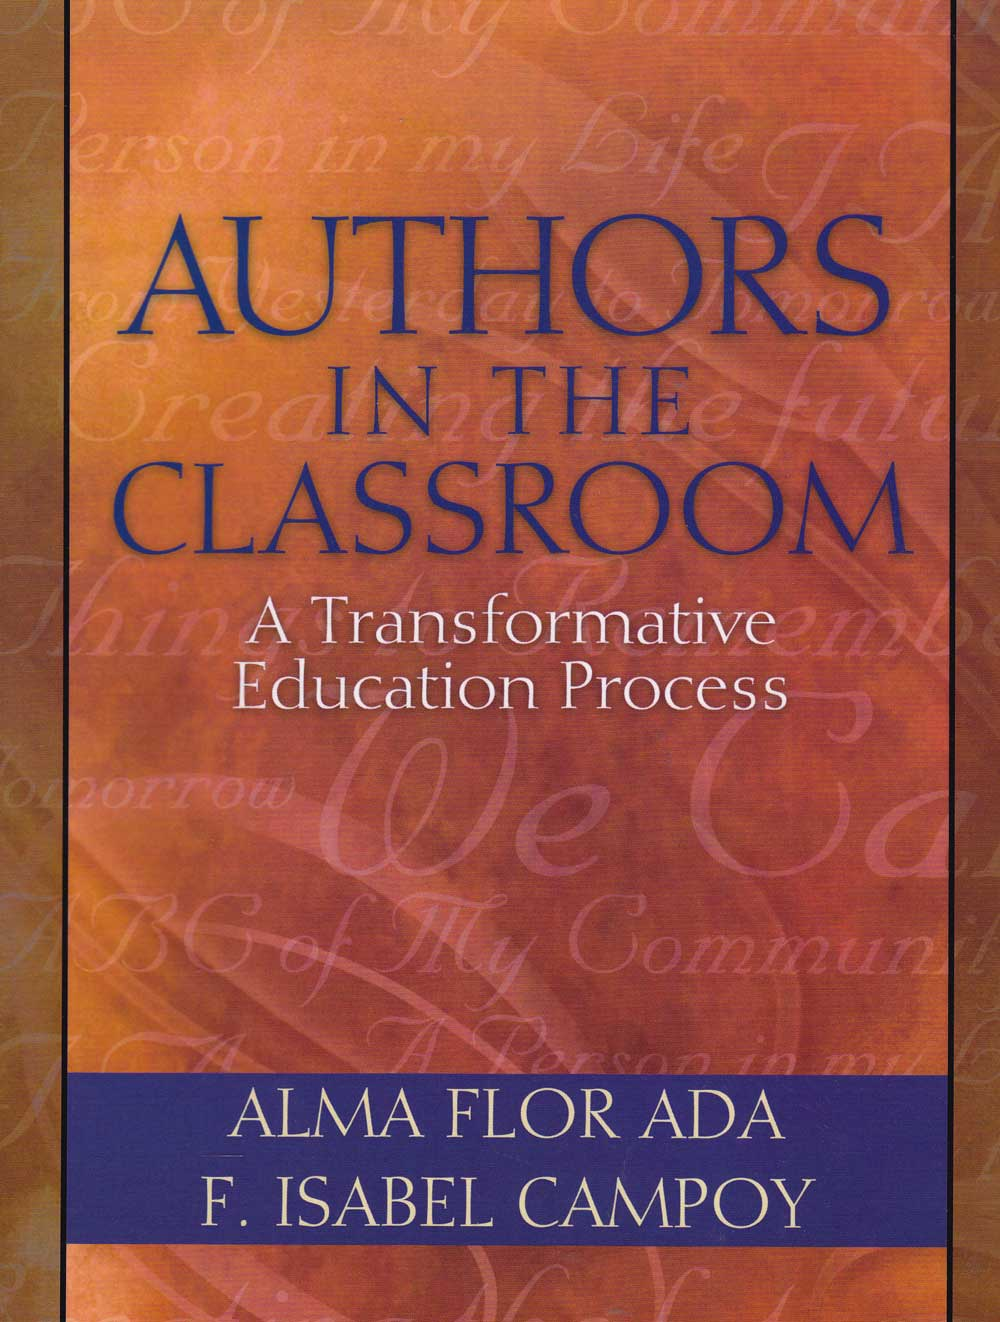 Teachers Collection, Rey Del Sol, Del Sol Books, Del Sol University